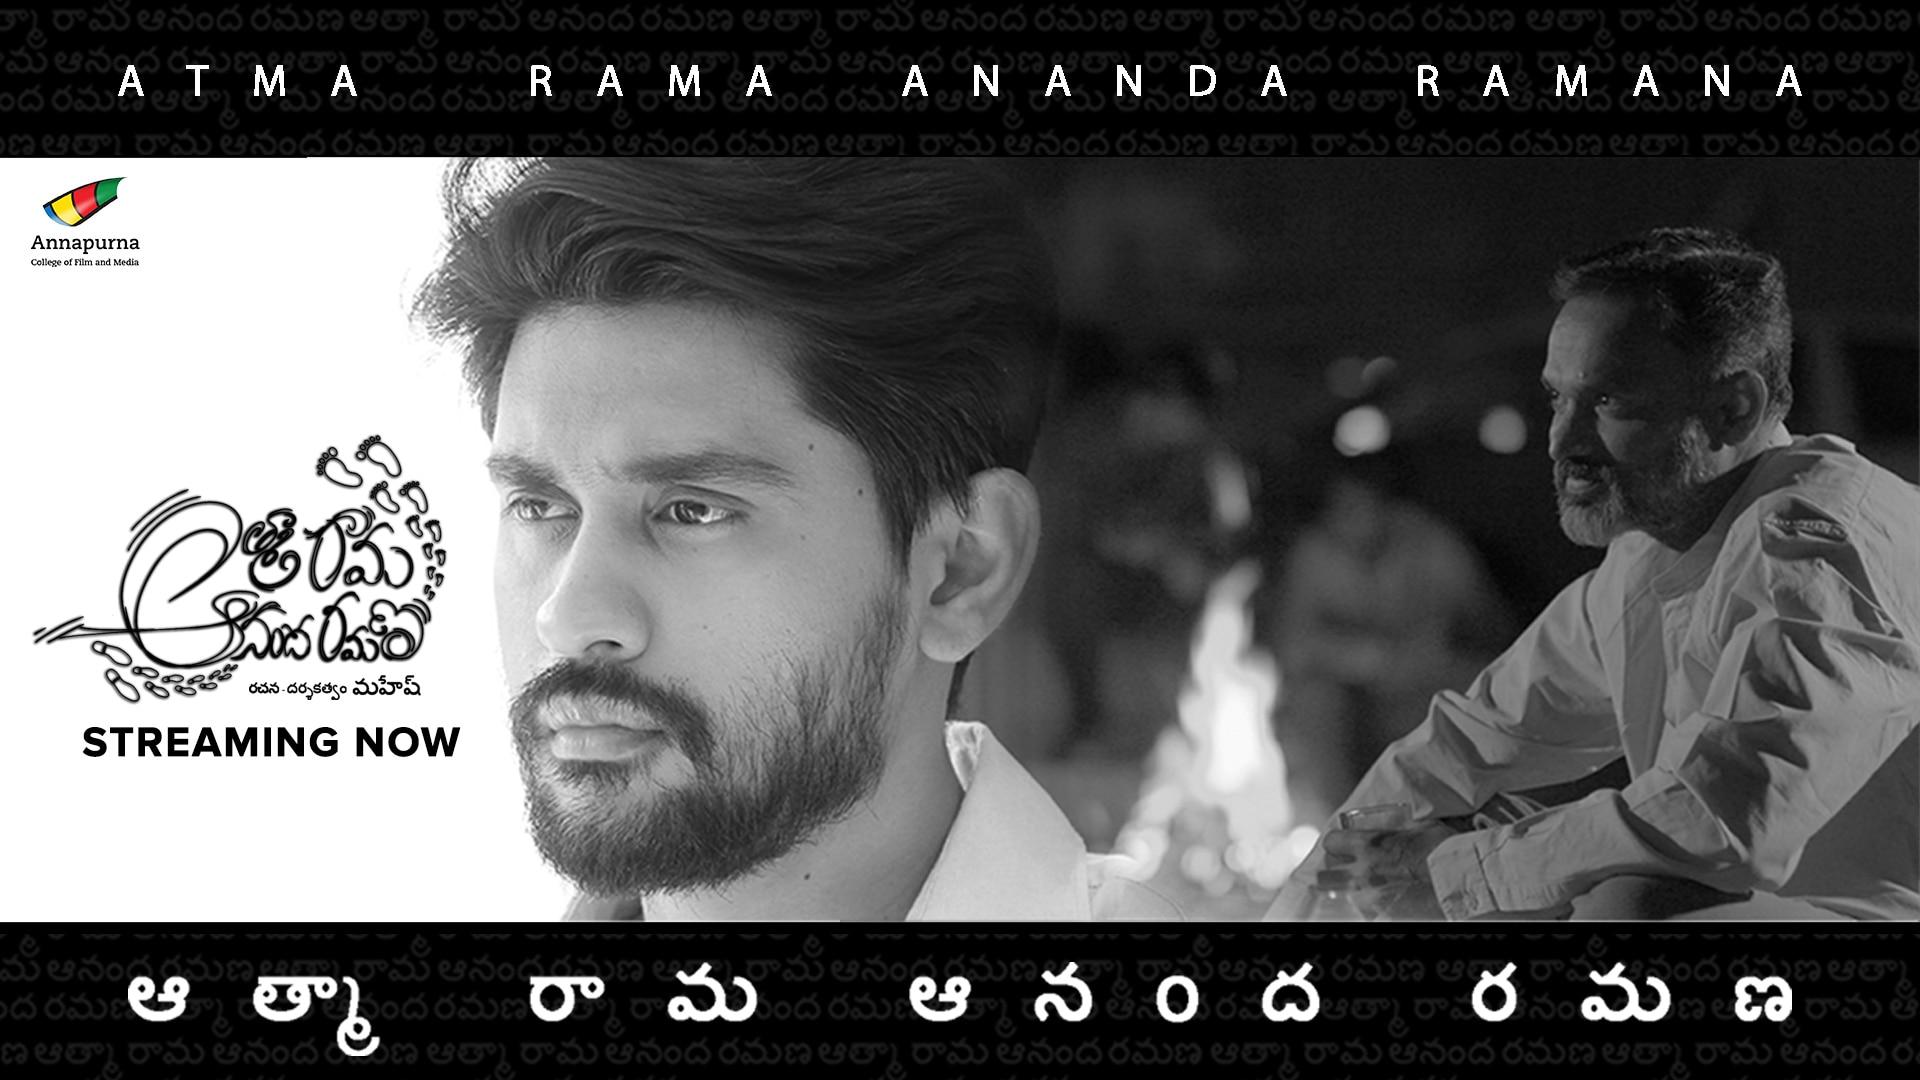 Atma Rama Ananda Ramana 2020 Telugu 720p HDRip 150MB Download